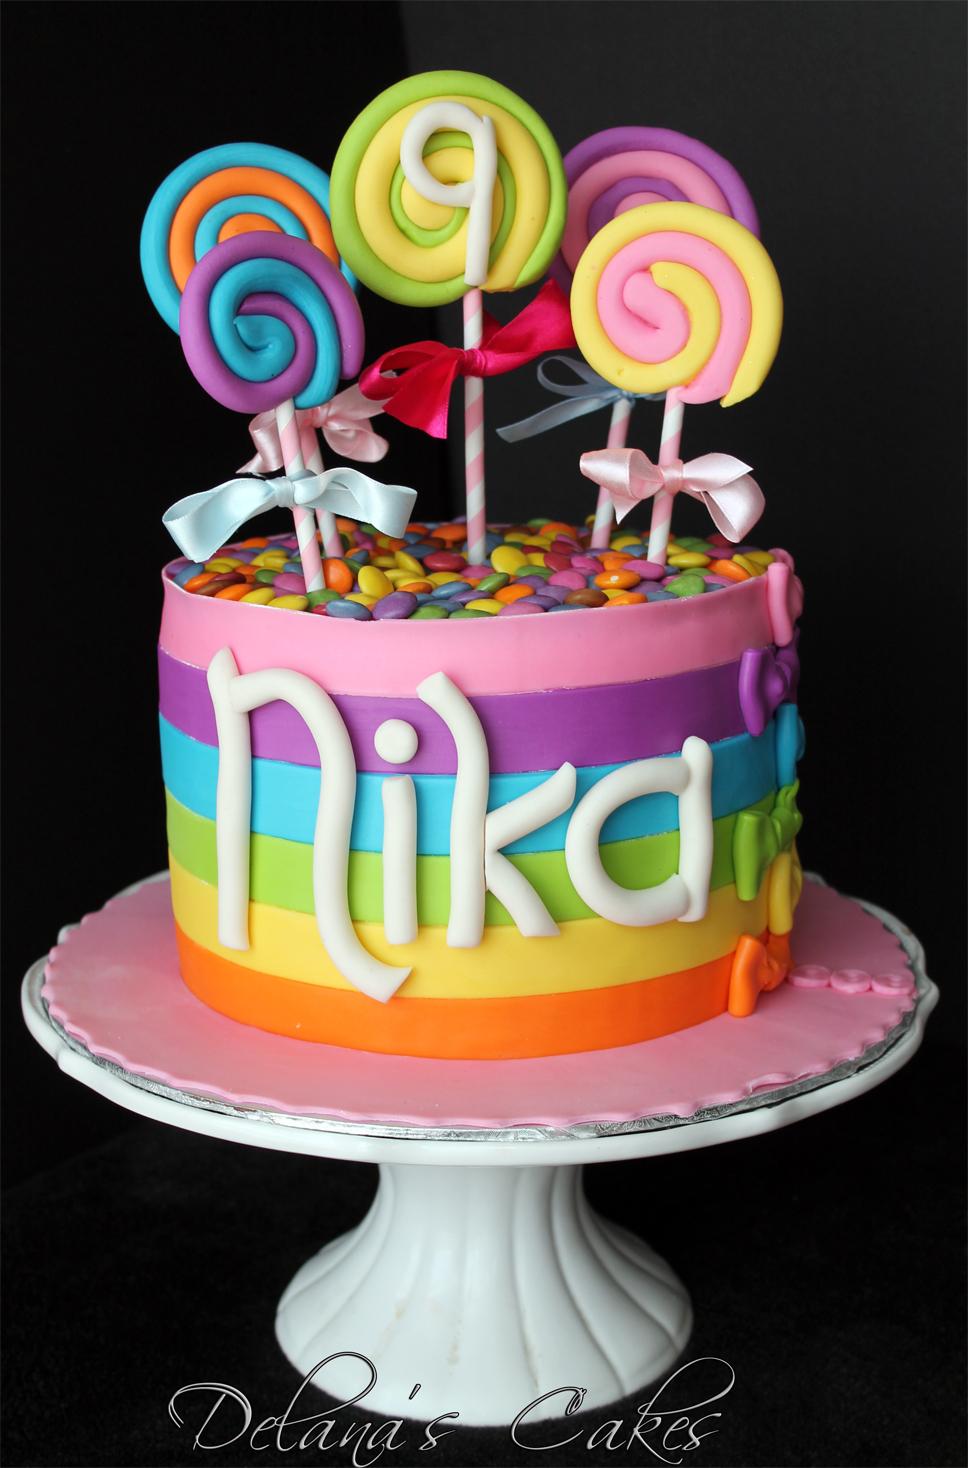 Delana's Cakes: Lollipop cake